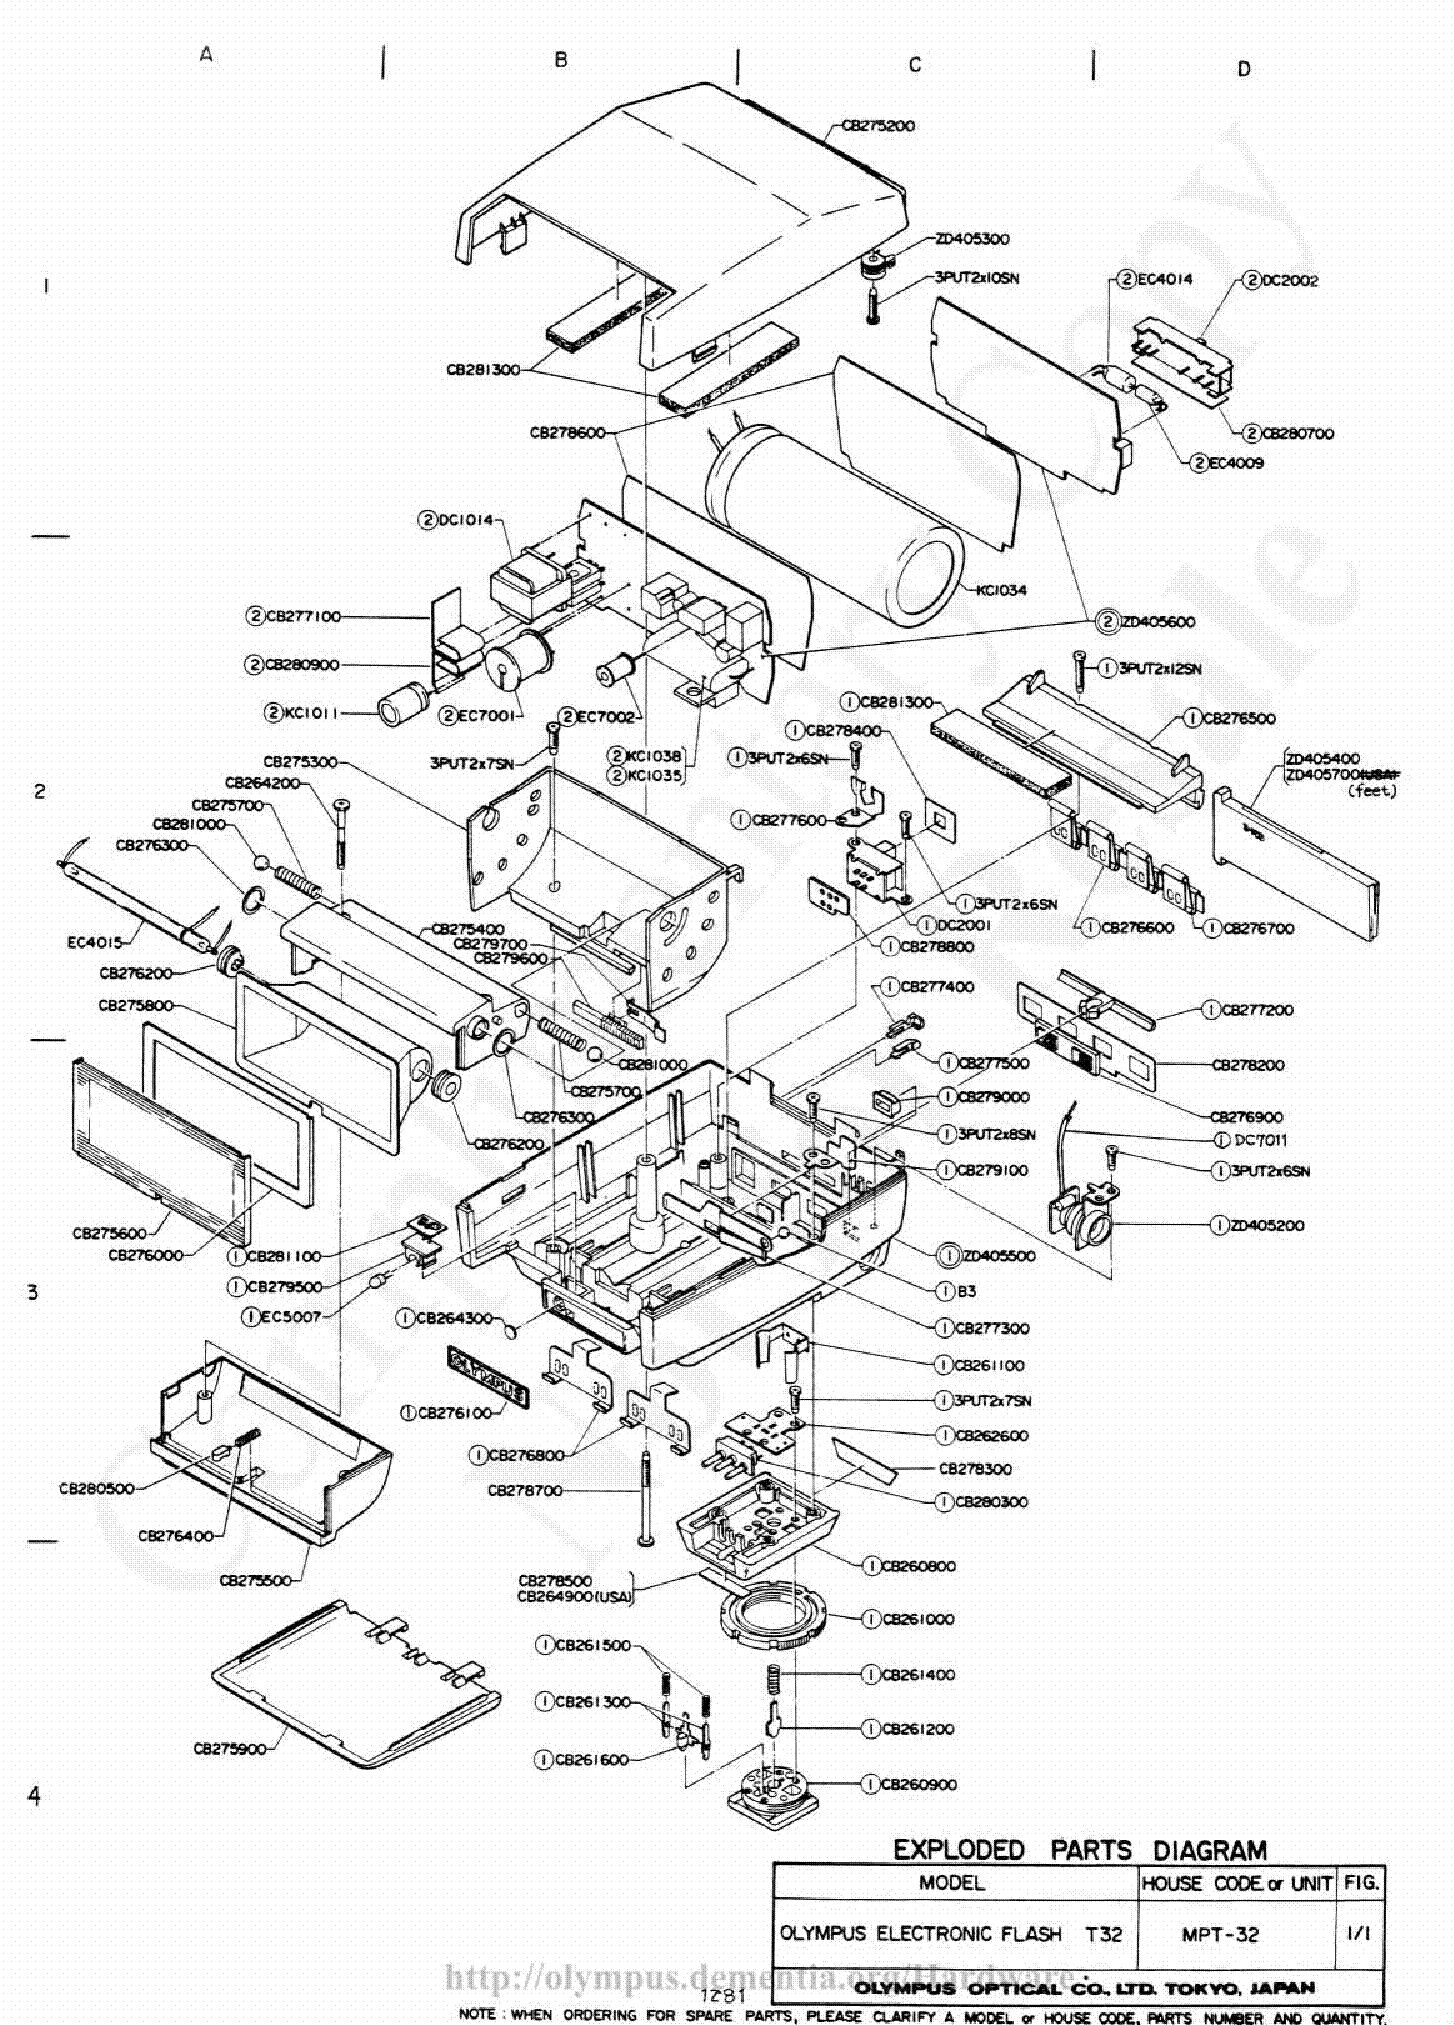 Pin Ar 15 Exploded Parts Diagram